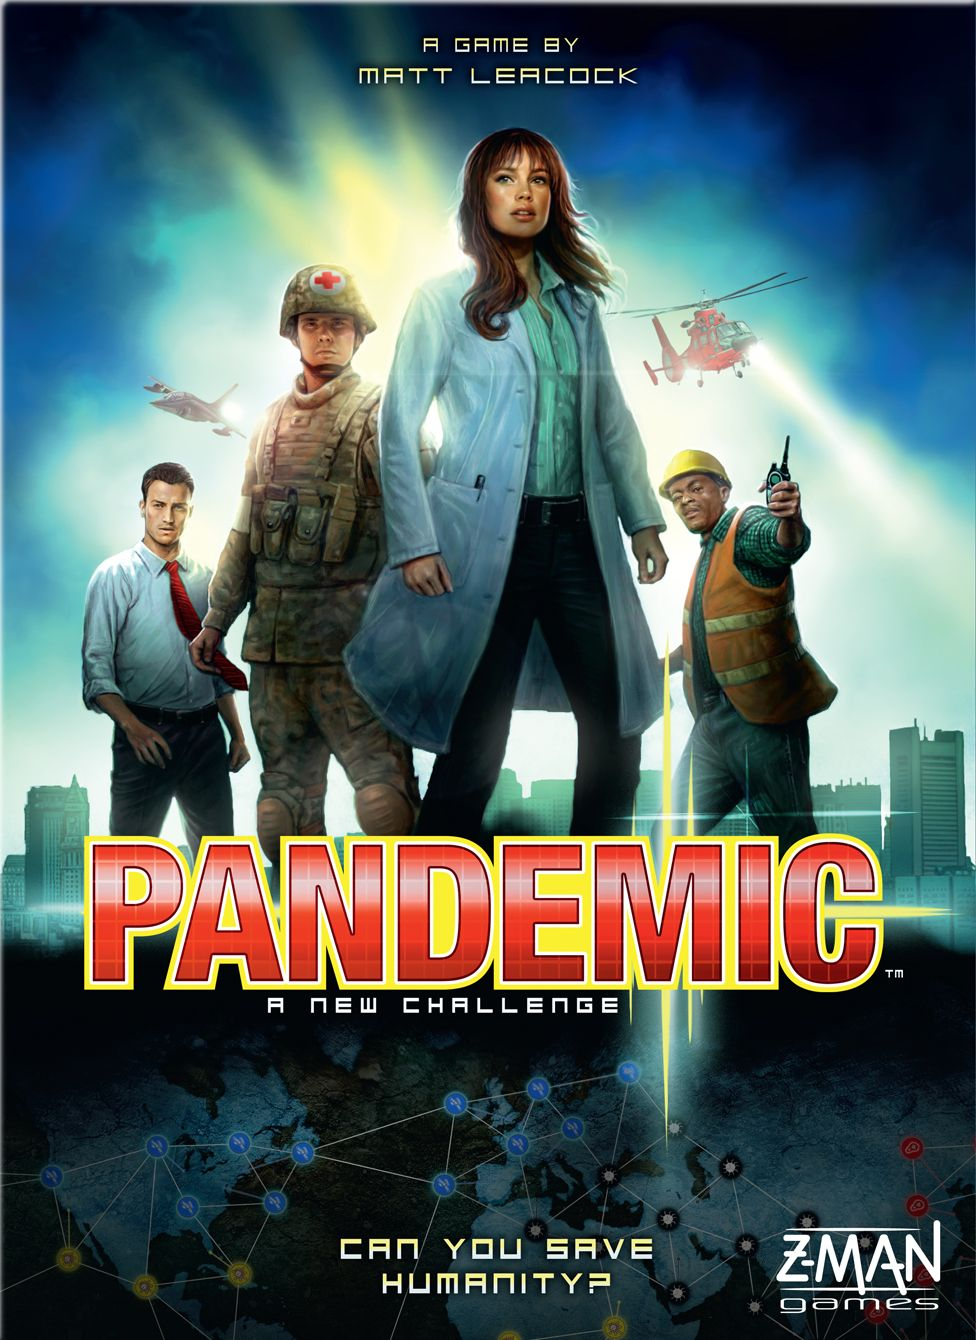 pandemie34148